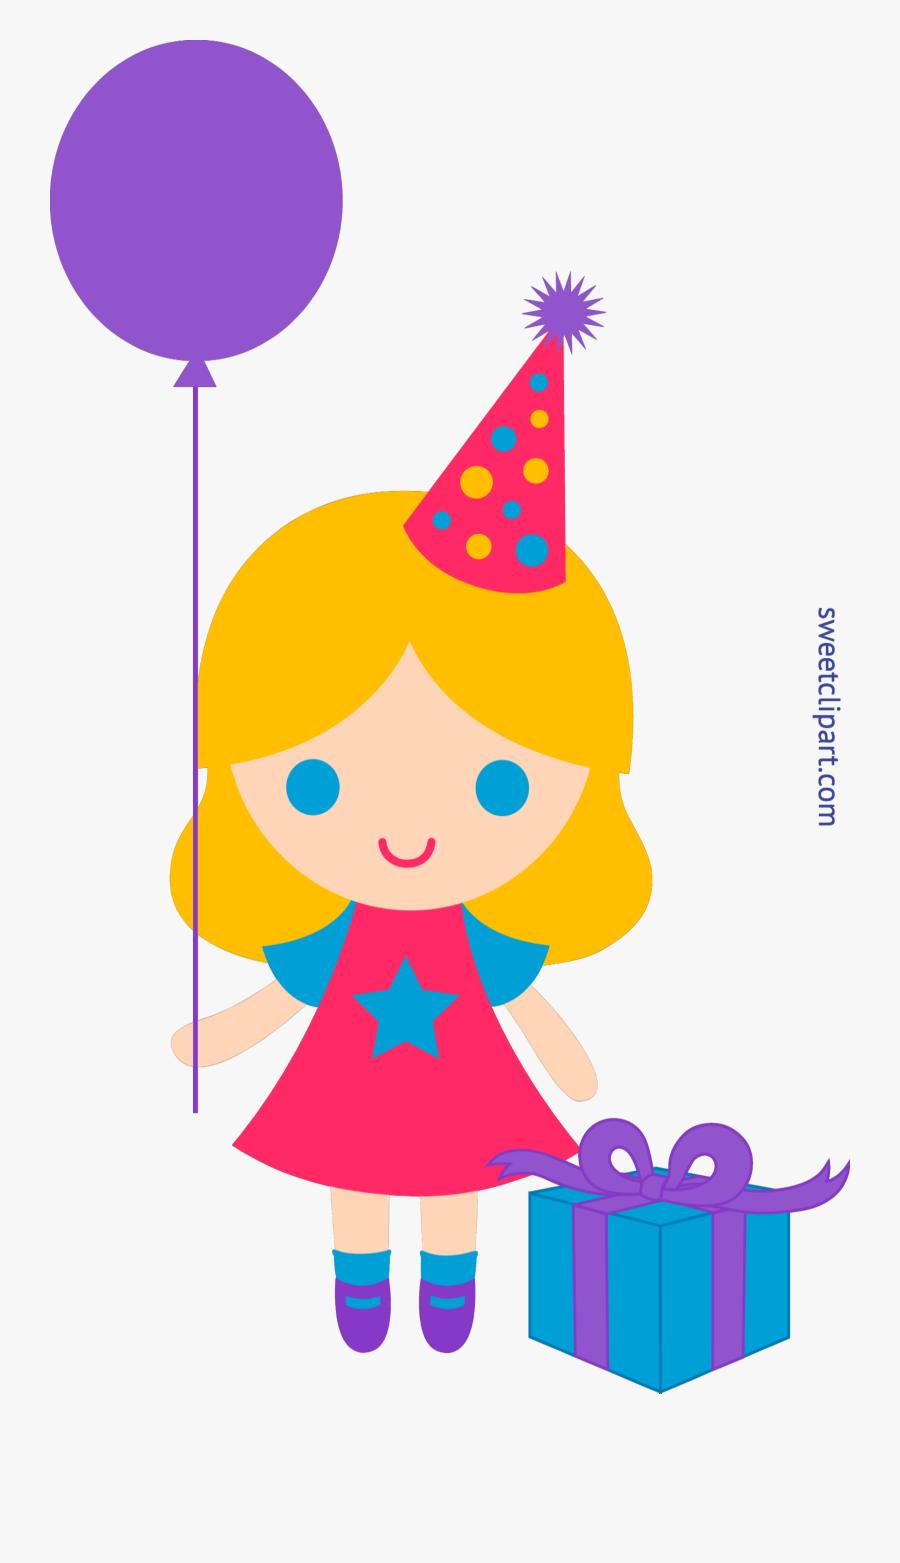 Birthday Girl Clip Art - Happy Birthday Girl Clipart, Transparent Clipart